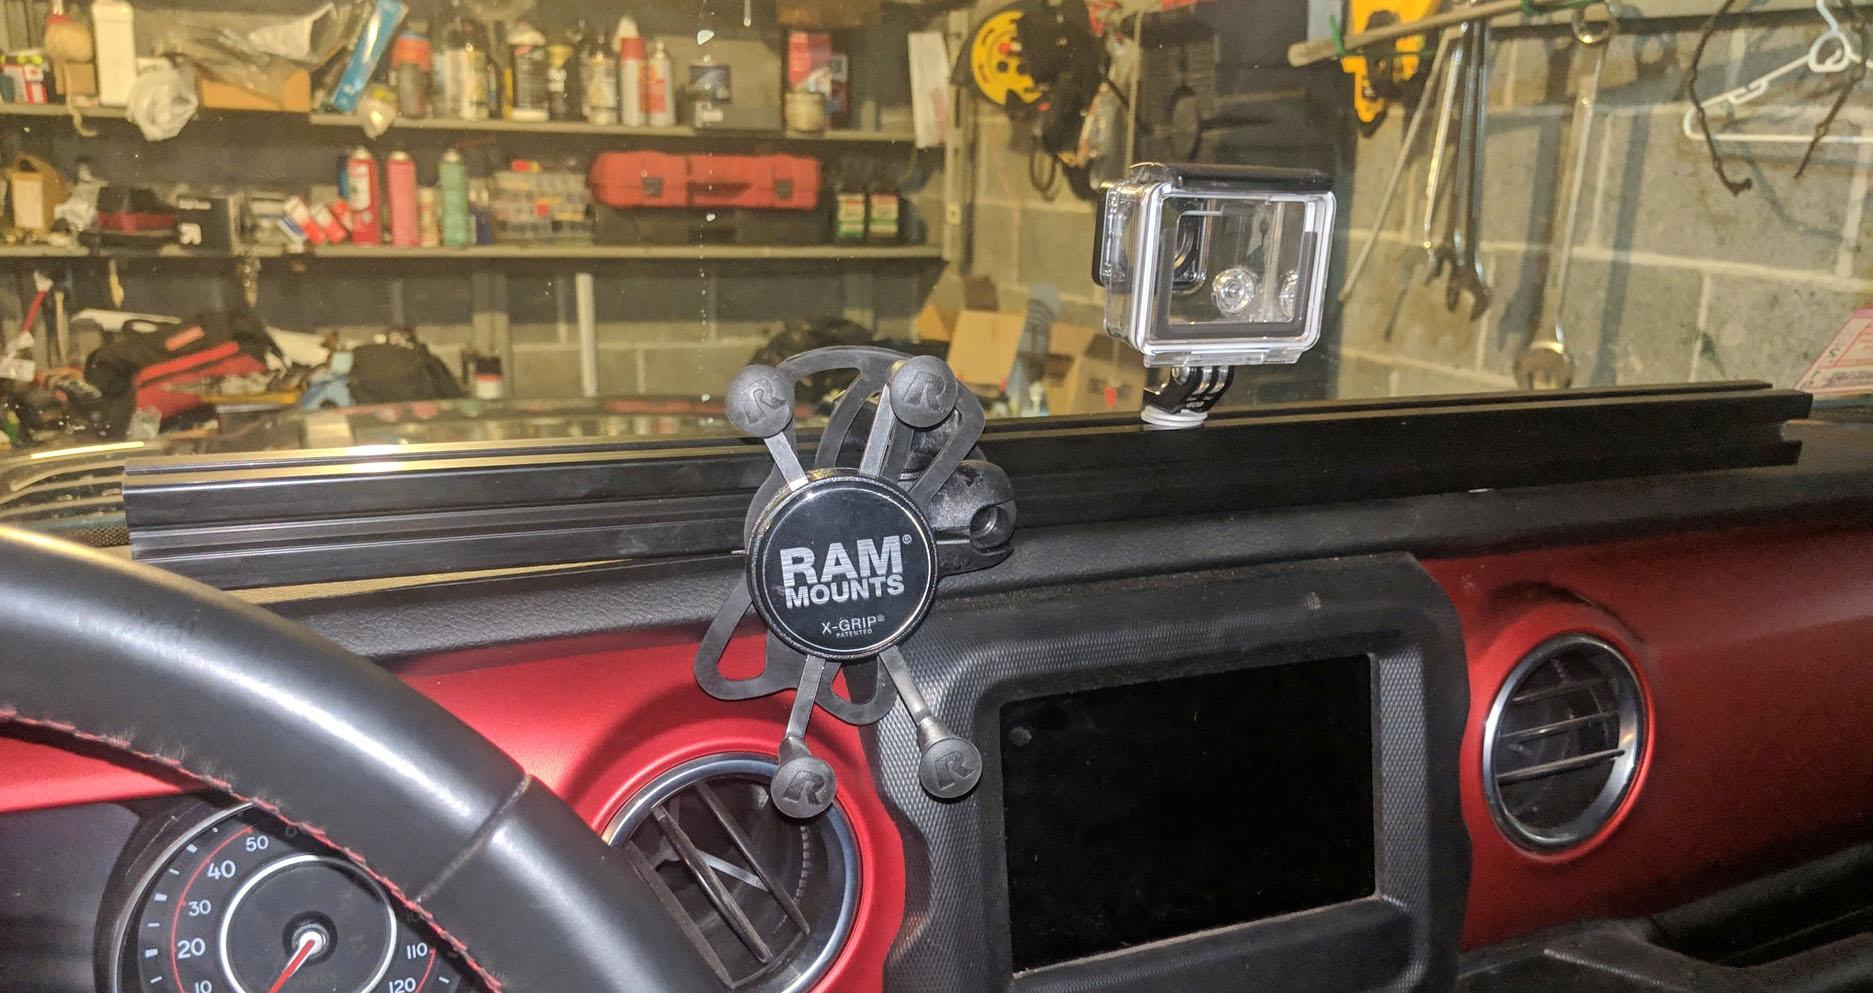 Build A Jeep >> Fabricating a Home Made Dash Rail Mount Bar for JL (DIY Writeup) – 2018+ Jeep Wrangler (JL) News ...